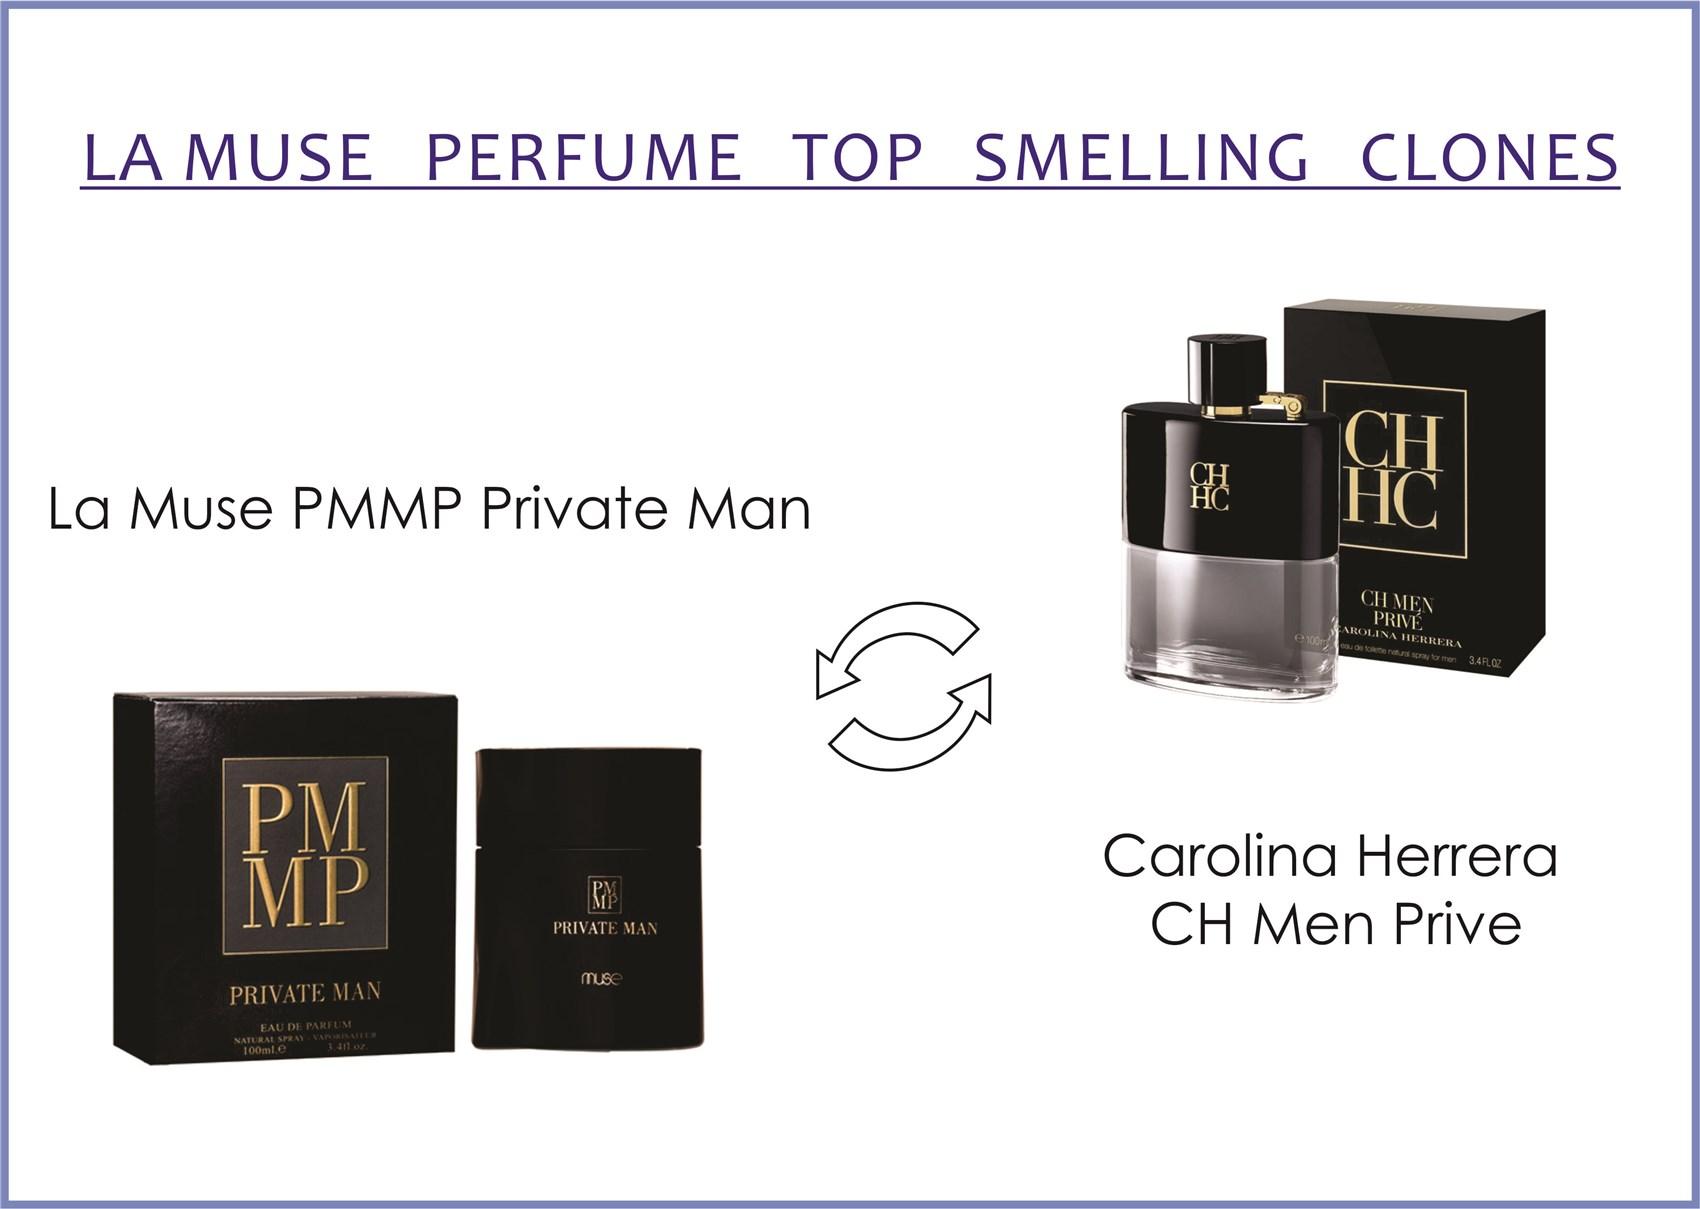 la-muse-private-man-for-men-100-ml-edp-by-lattafa-perfumes-carolina-herrera-ch-prive-men-perfume-for-men-100-ml-edt